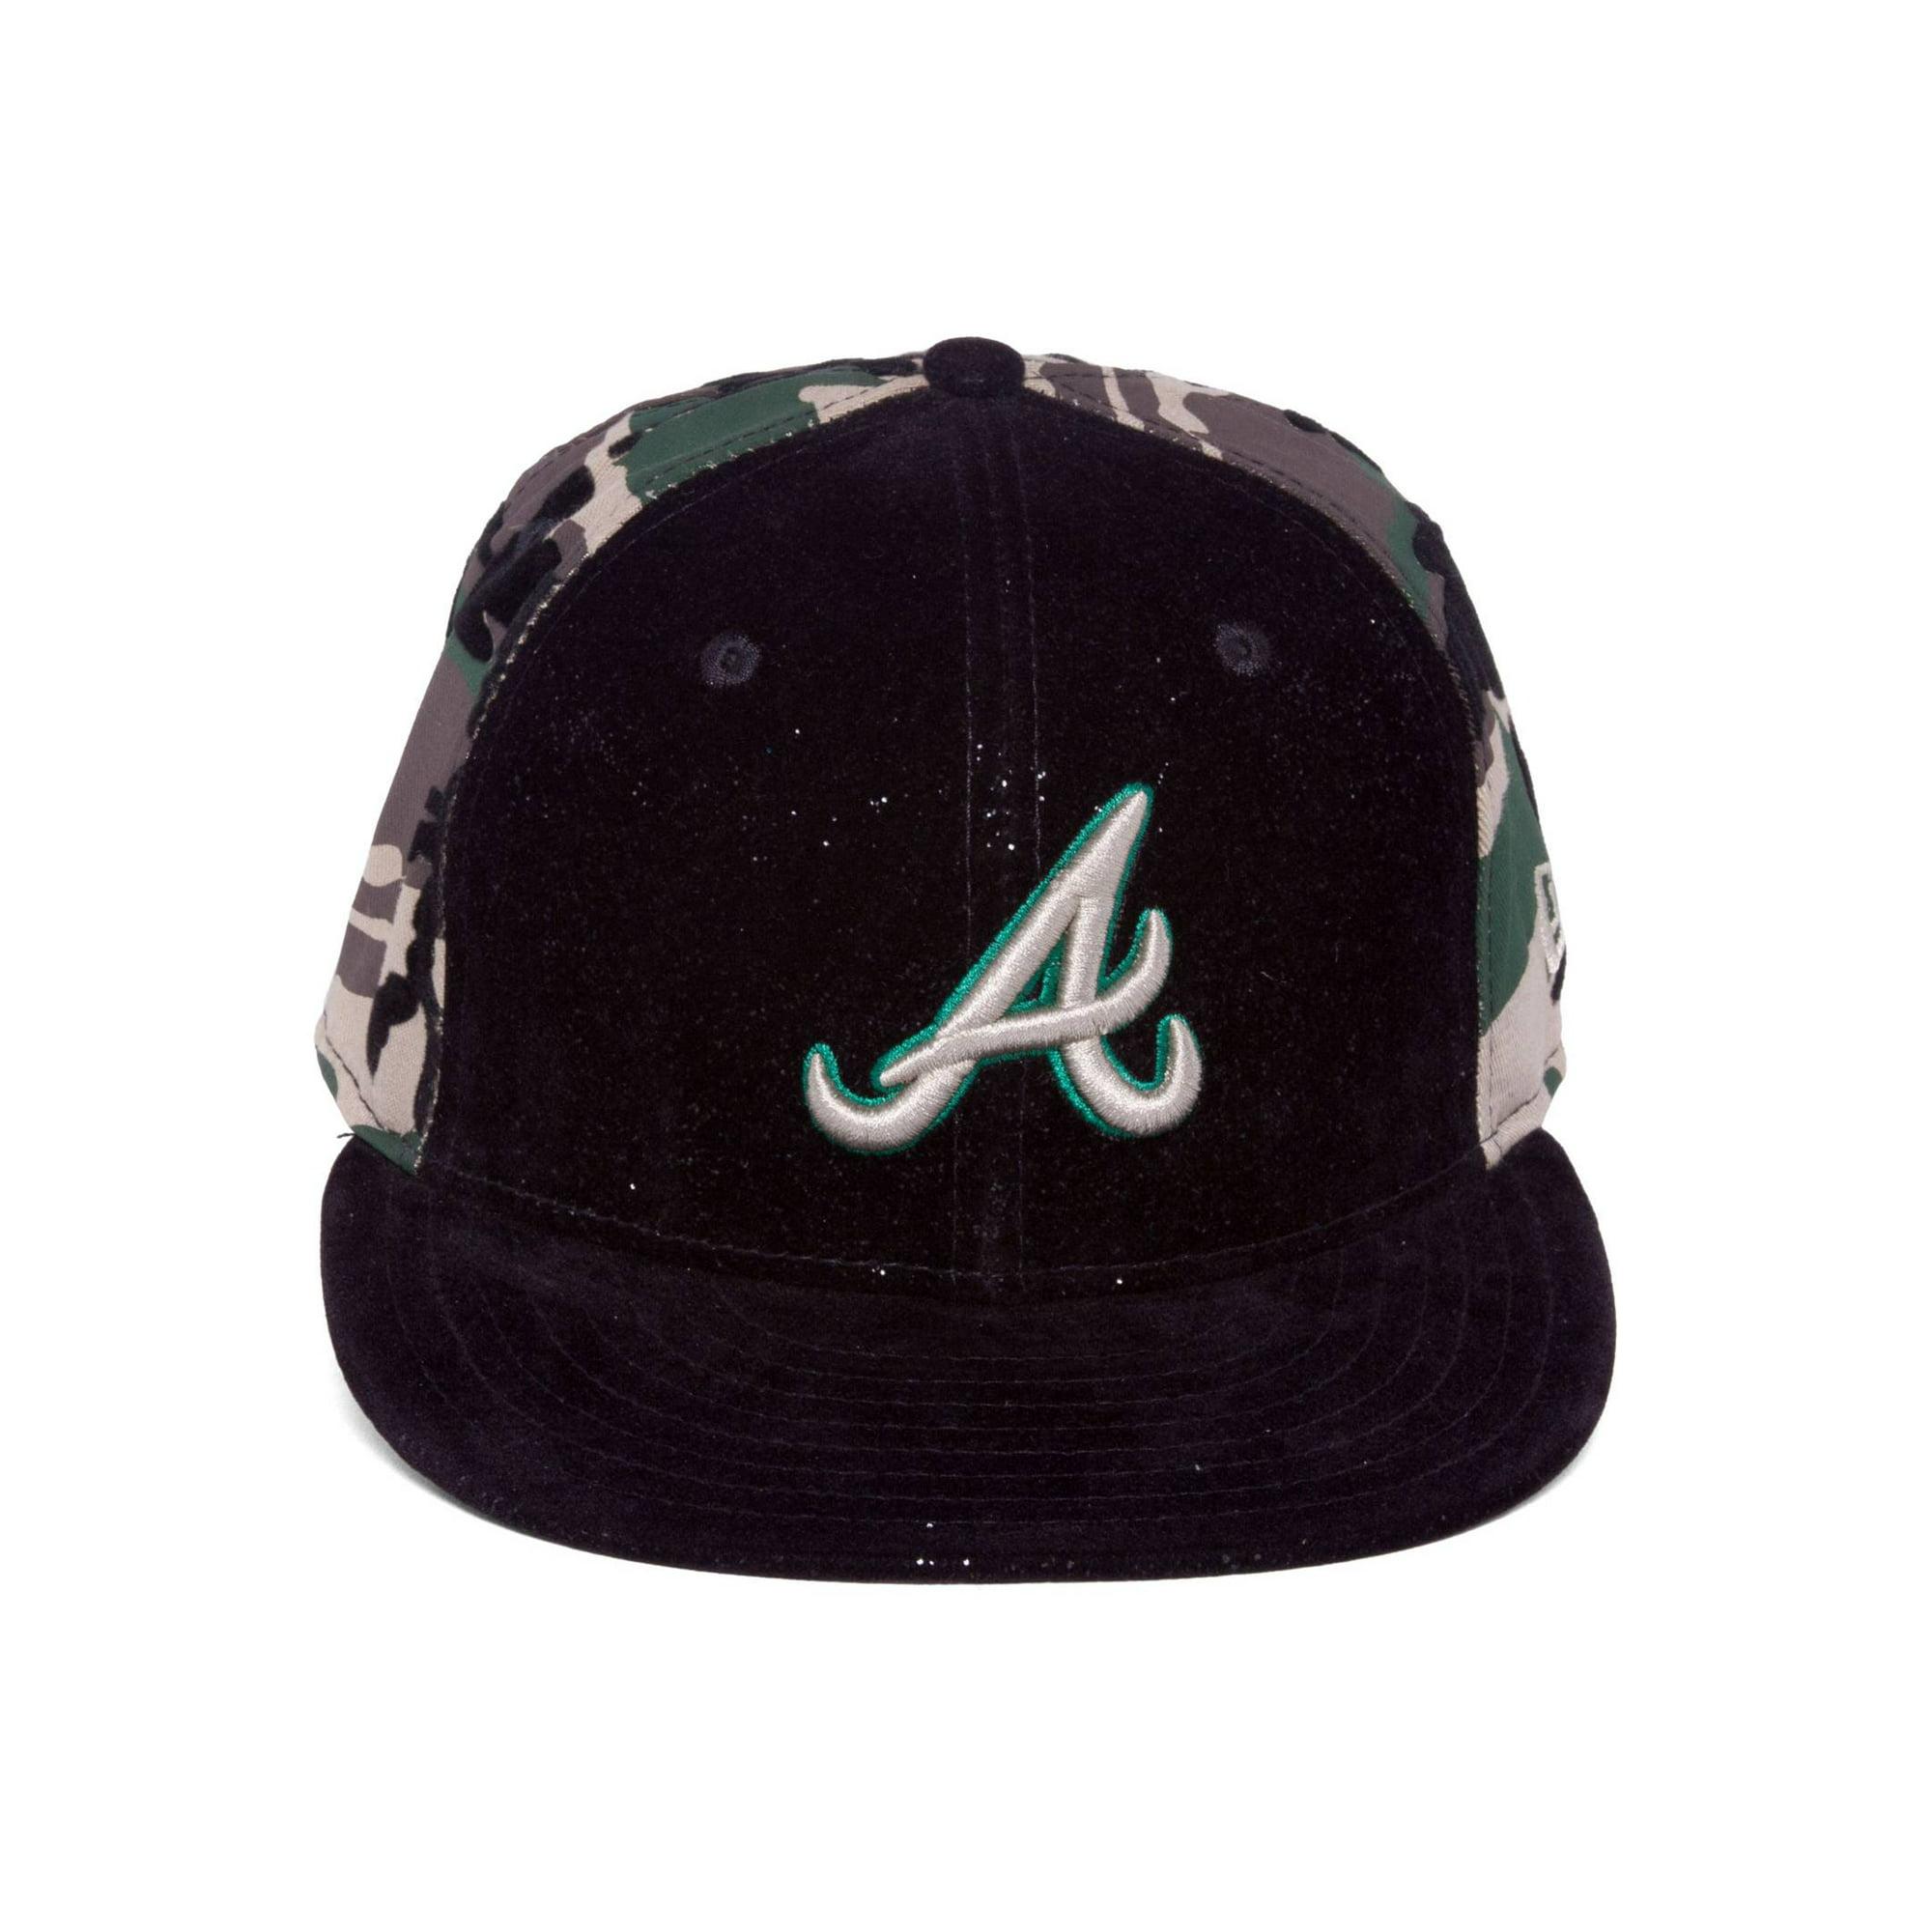 8a372ac4a Atlanta Braves Fitted New Era Custom Hat Cap - Black/Camo 7